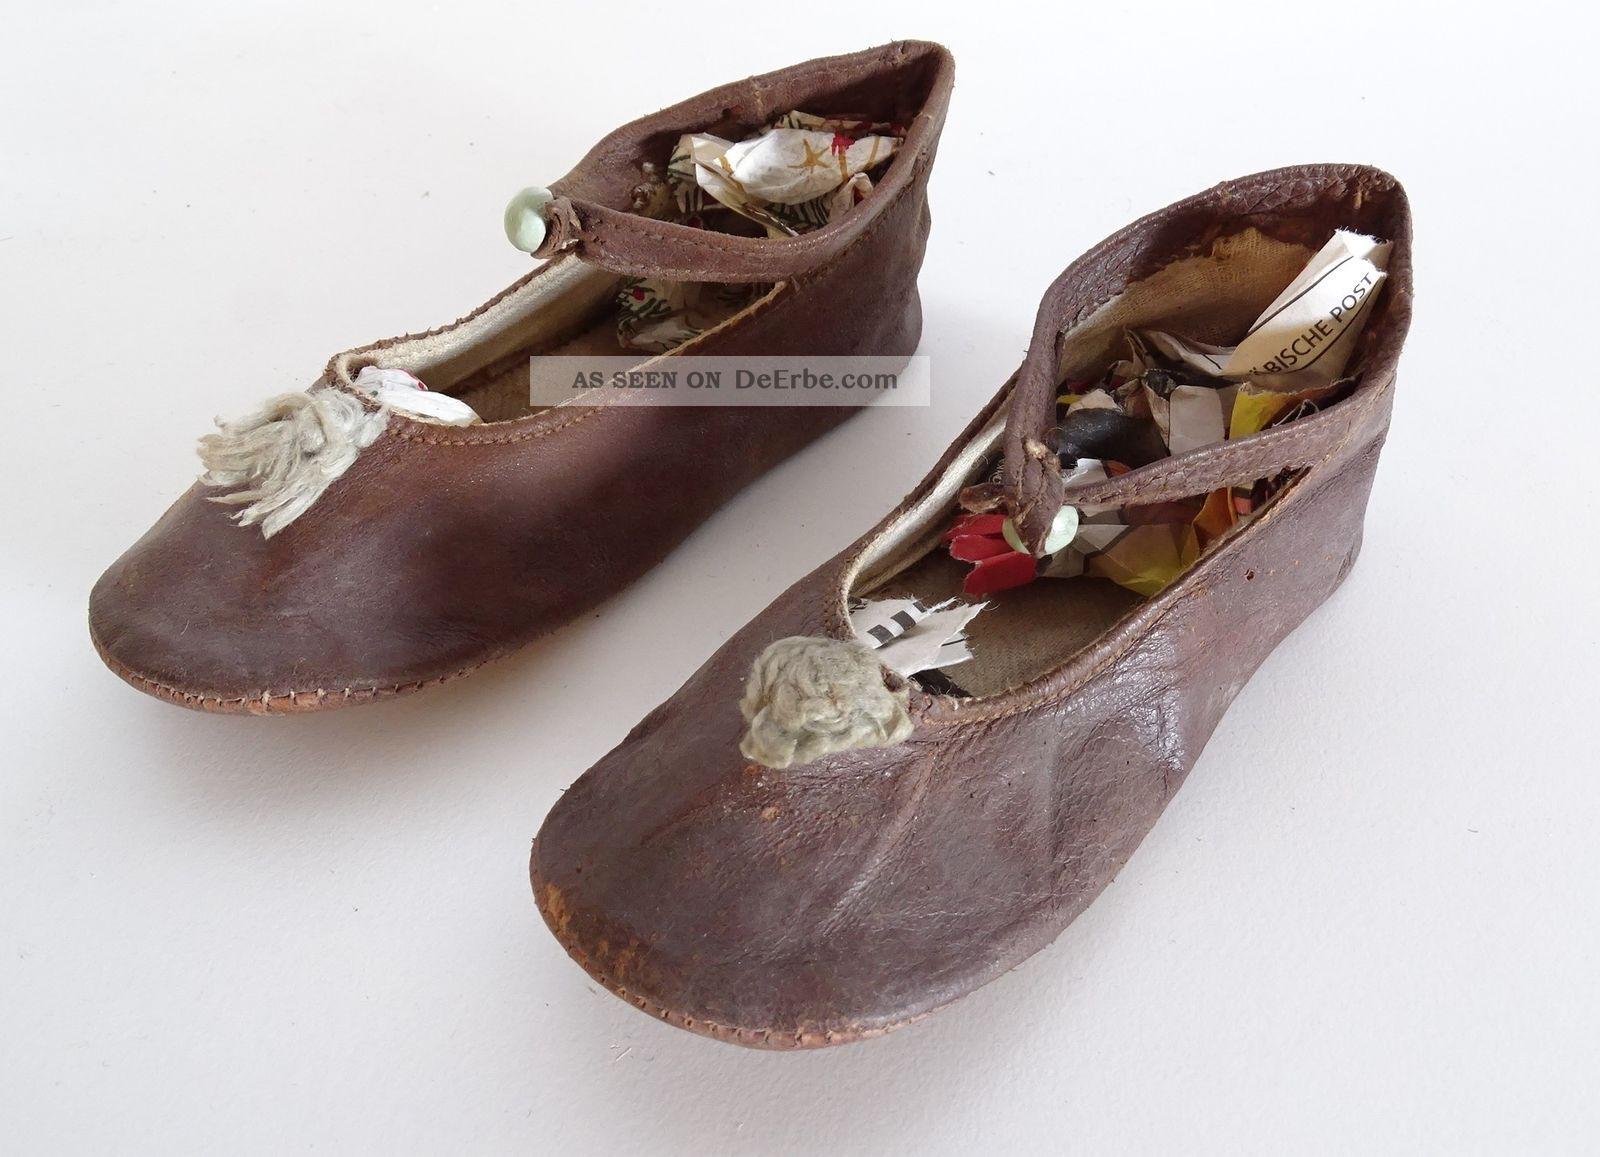 Paar Antike Leder Kinderschuhe Babyschuhe Doll Shoes Shabby Chic Um 1920/1930 Alte Berufe Bild